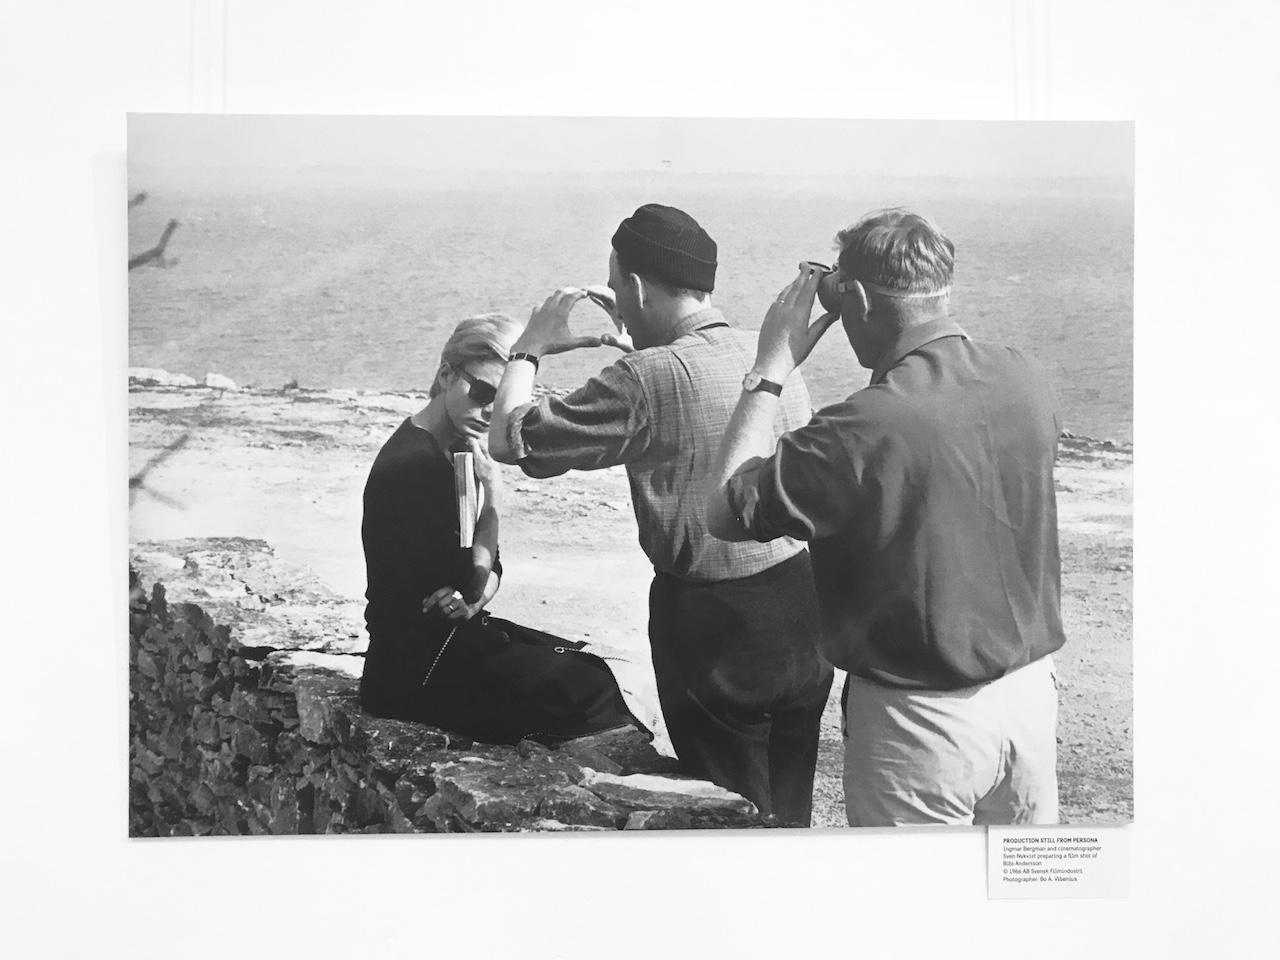 Ingmar Bergman expo